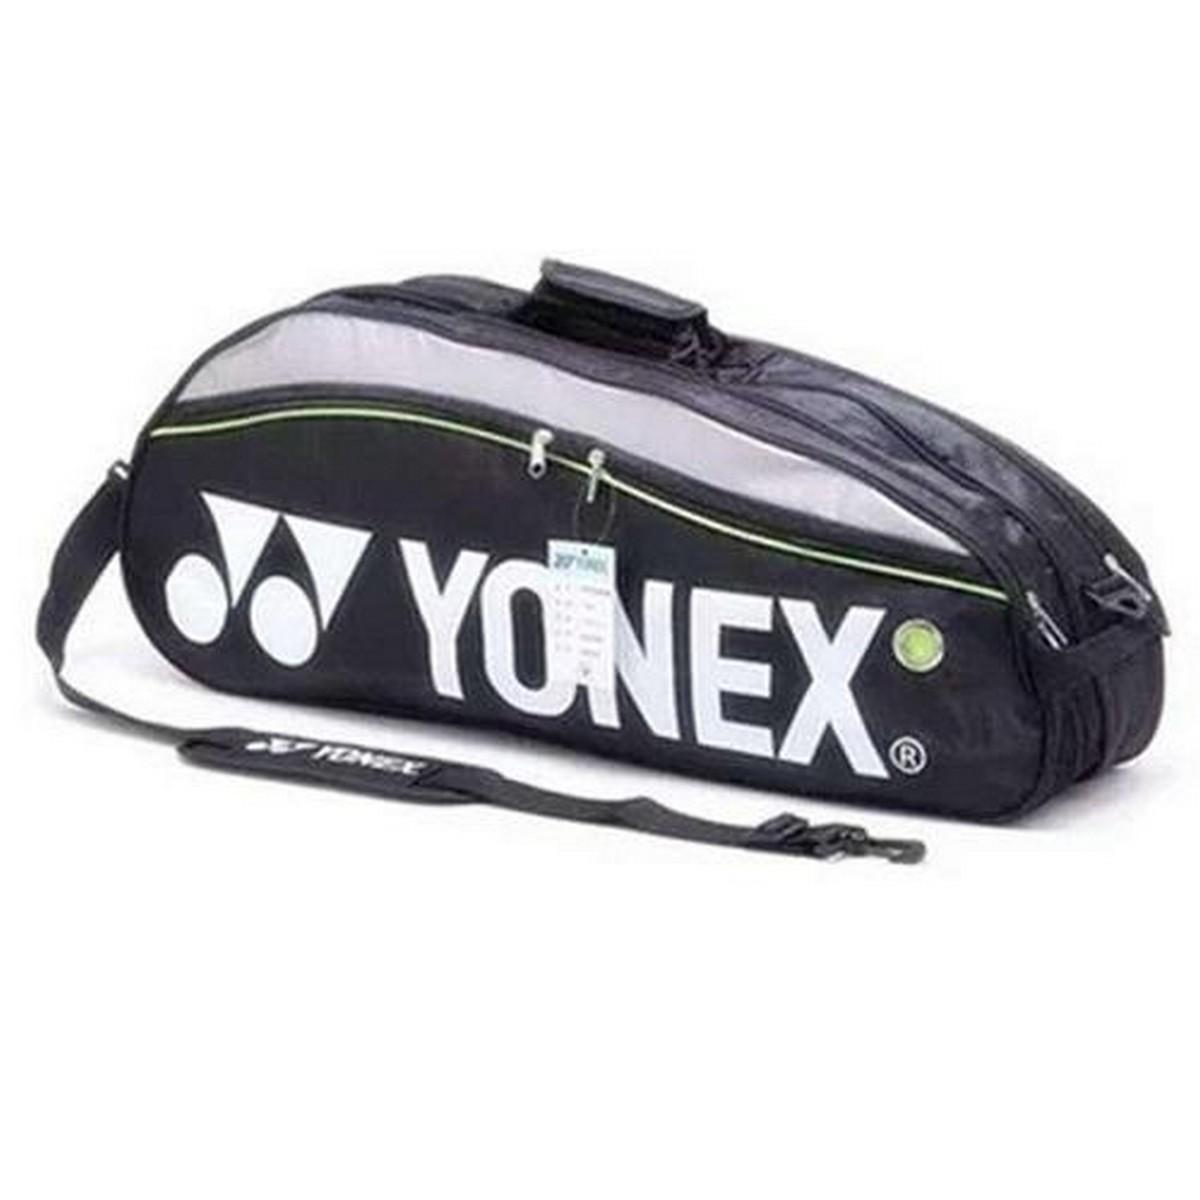 Yonex Badminton,Squash Bag Good Quality Black Colour